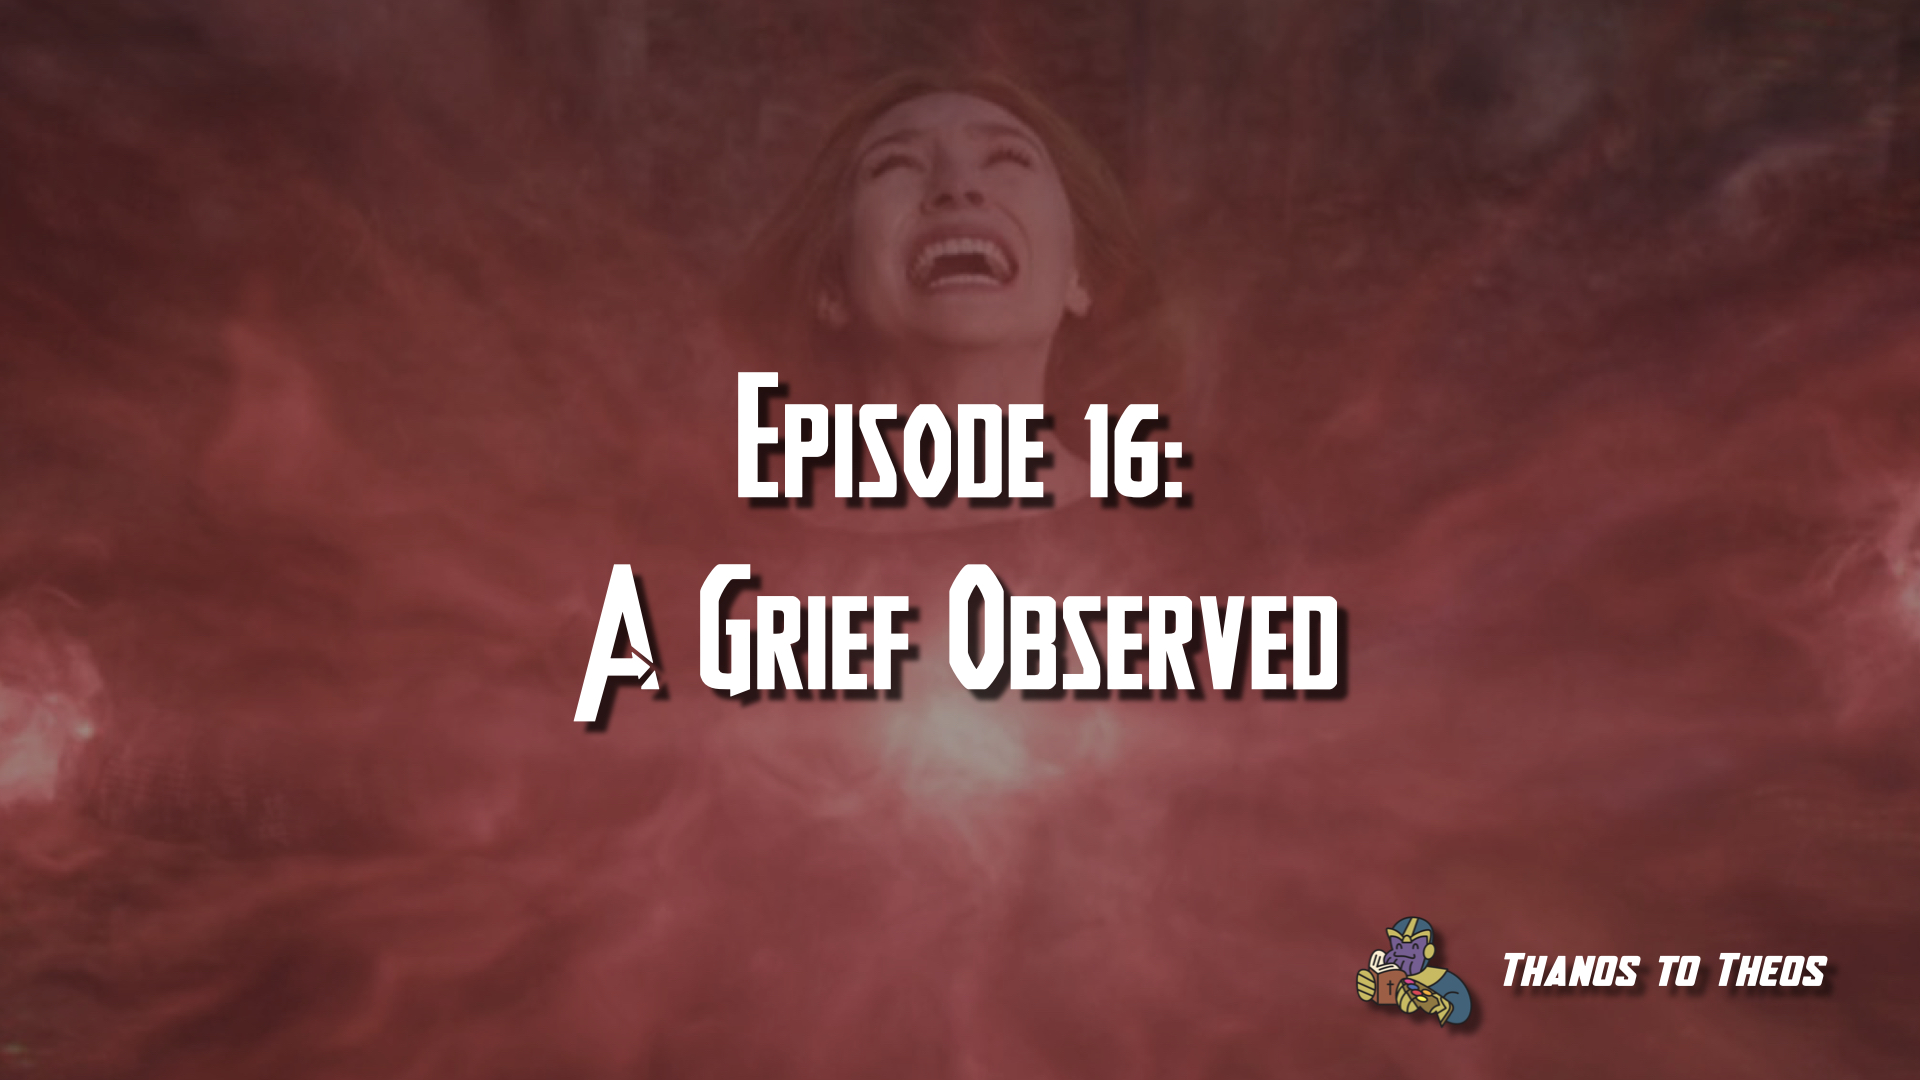 Episode 16: A Grief Observed